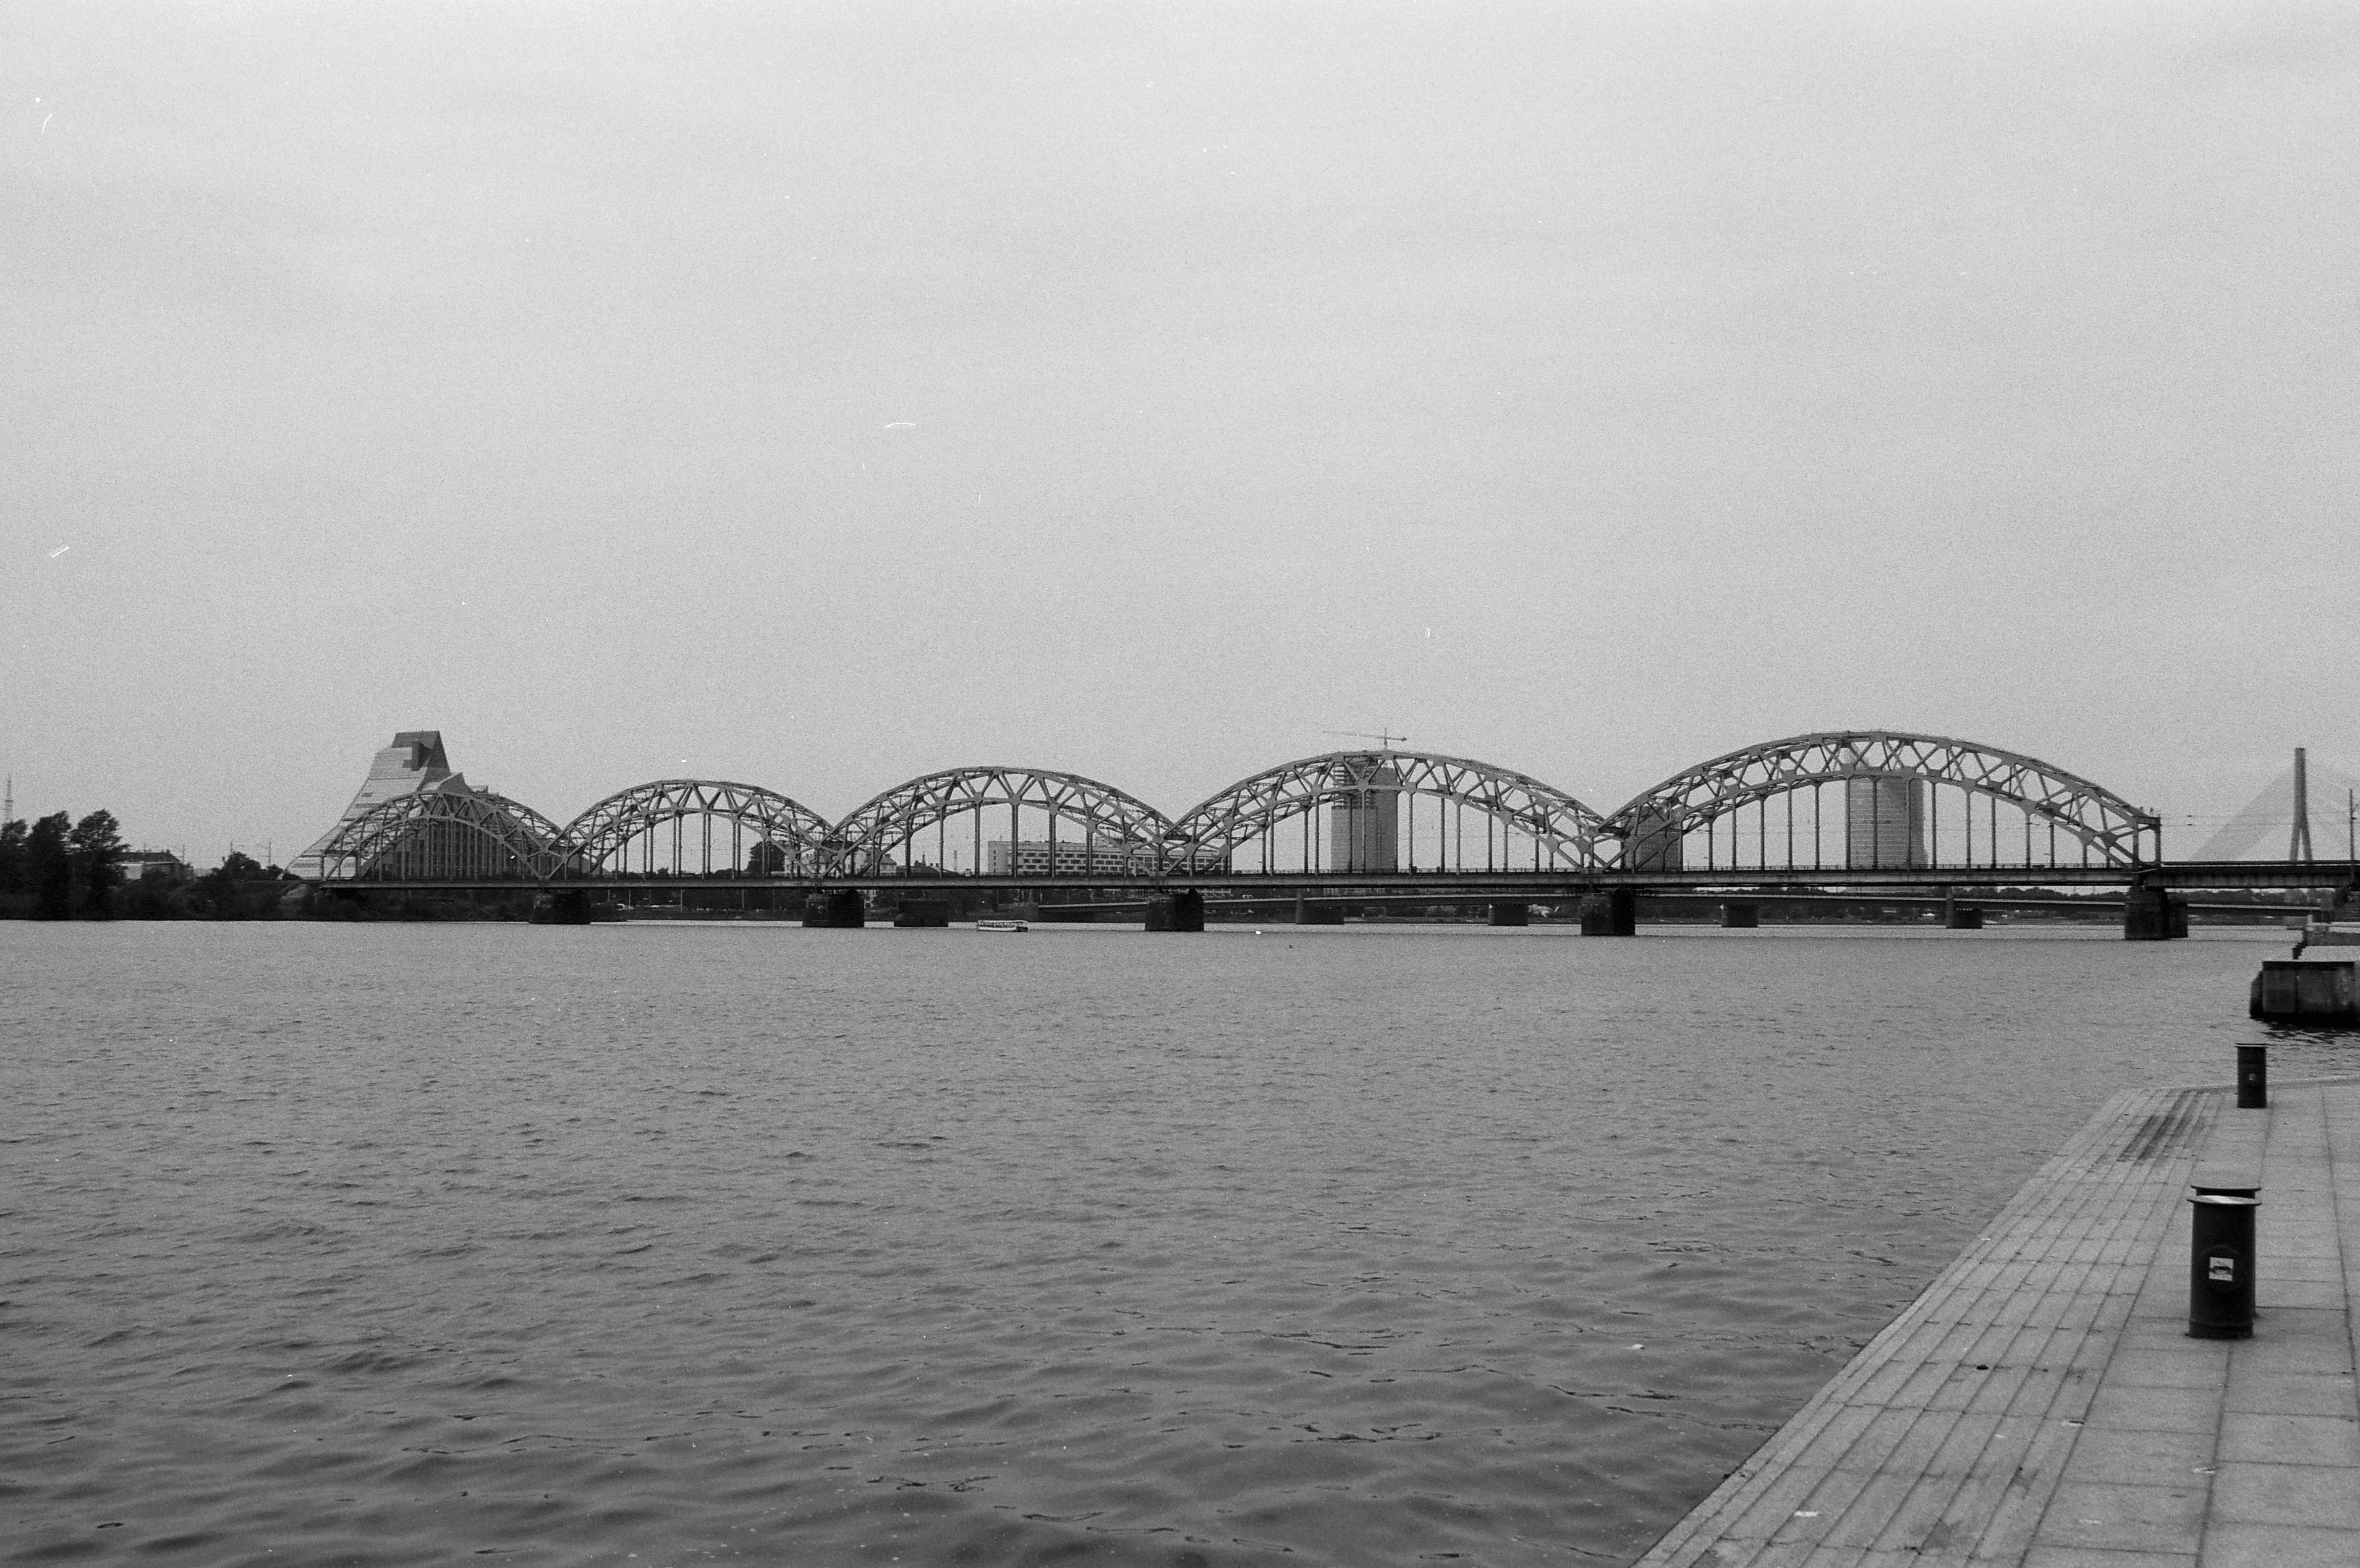 Riga, août 2015